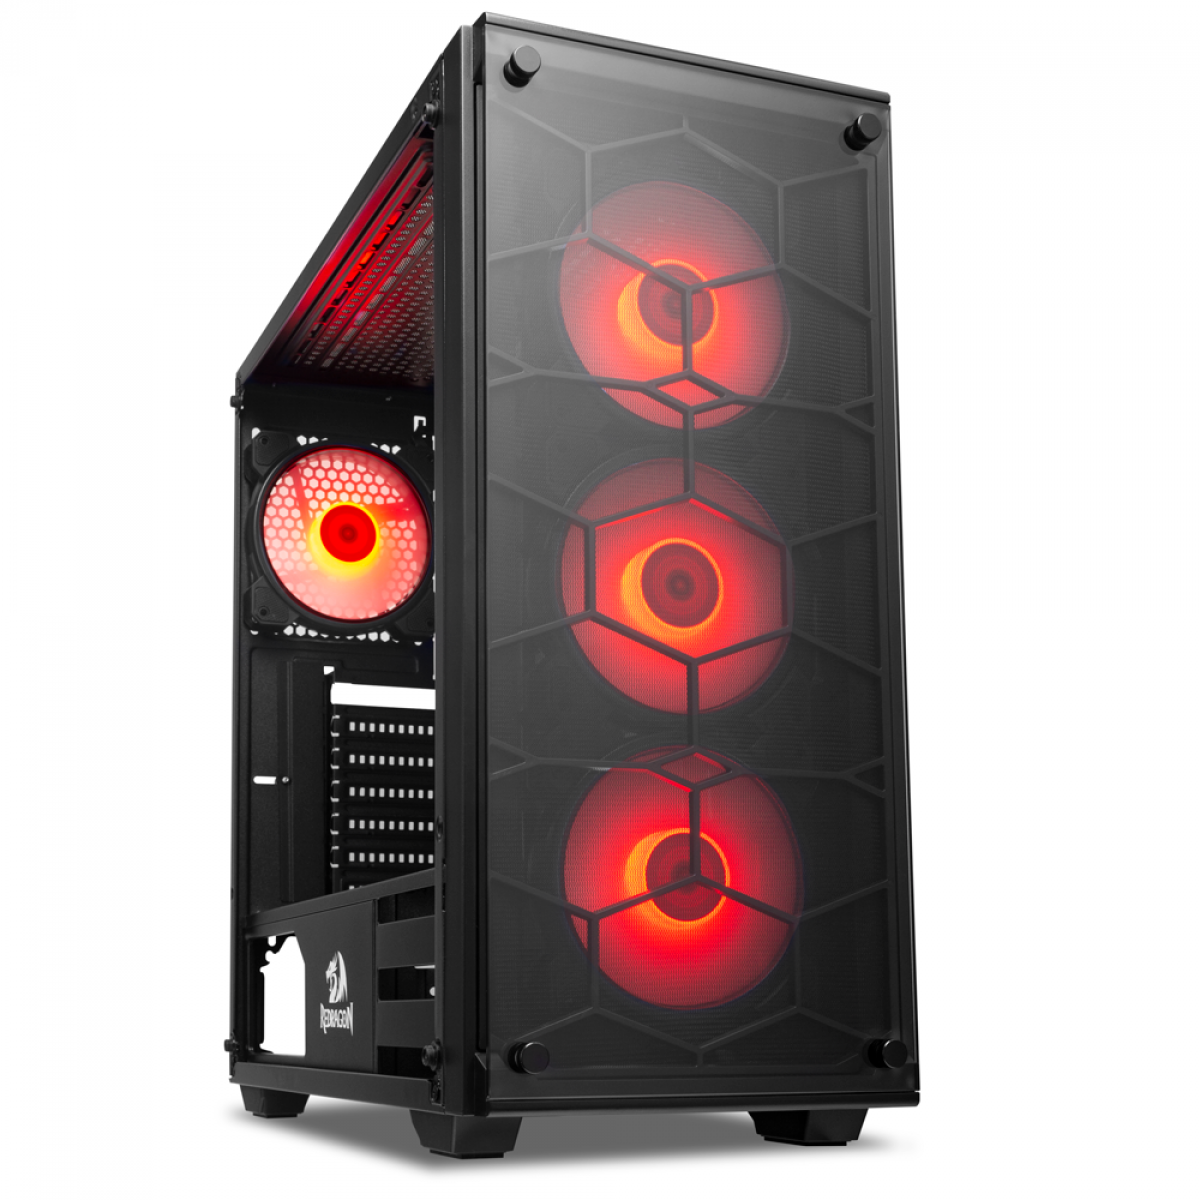 Gabinete Gamer Redragon Wheel Jack, Mid Tower, Vidro Temperado, Black, Sem fonte, Com 4 Fans Red